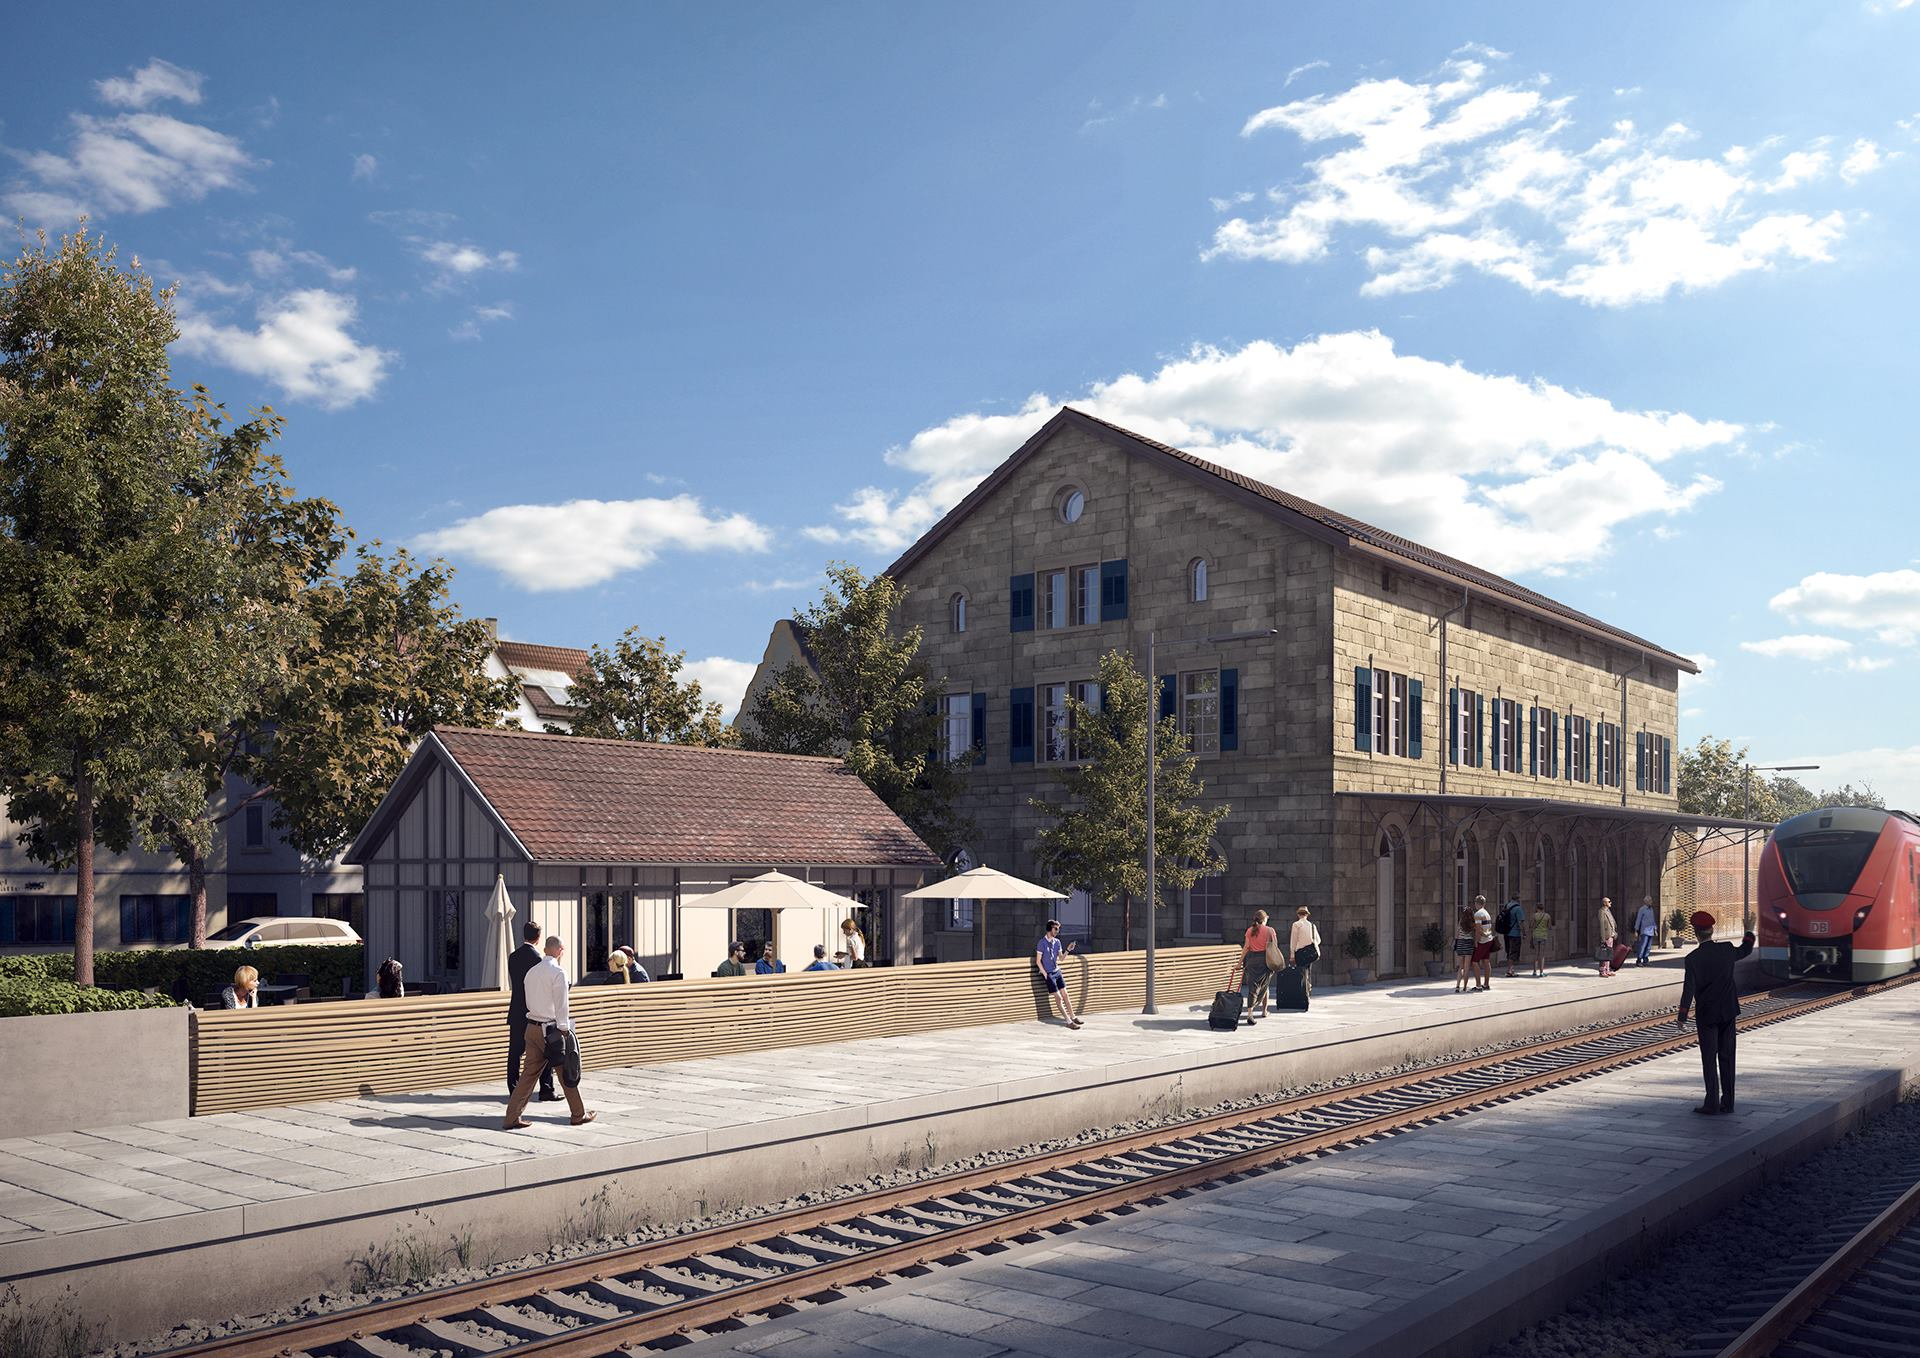 Exterior 3D Visualization of Rottenburg Train Station